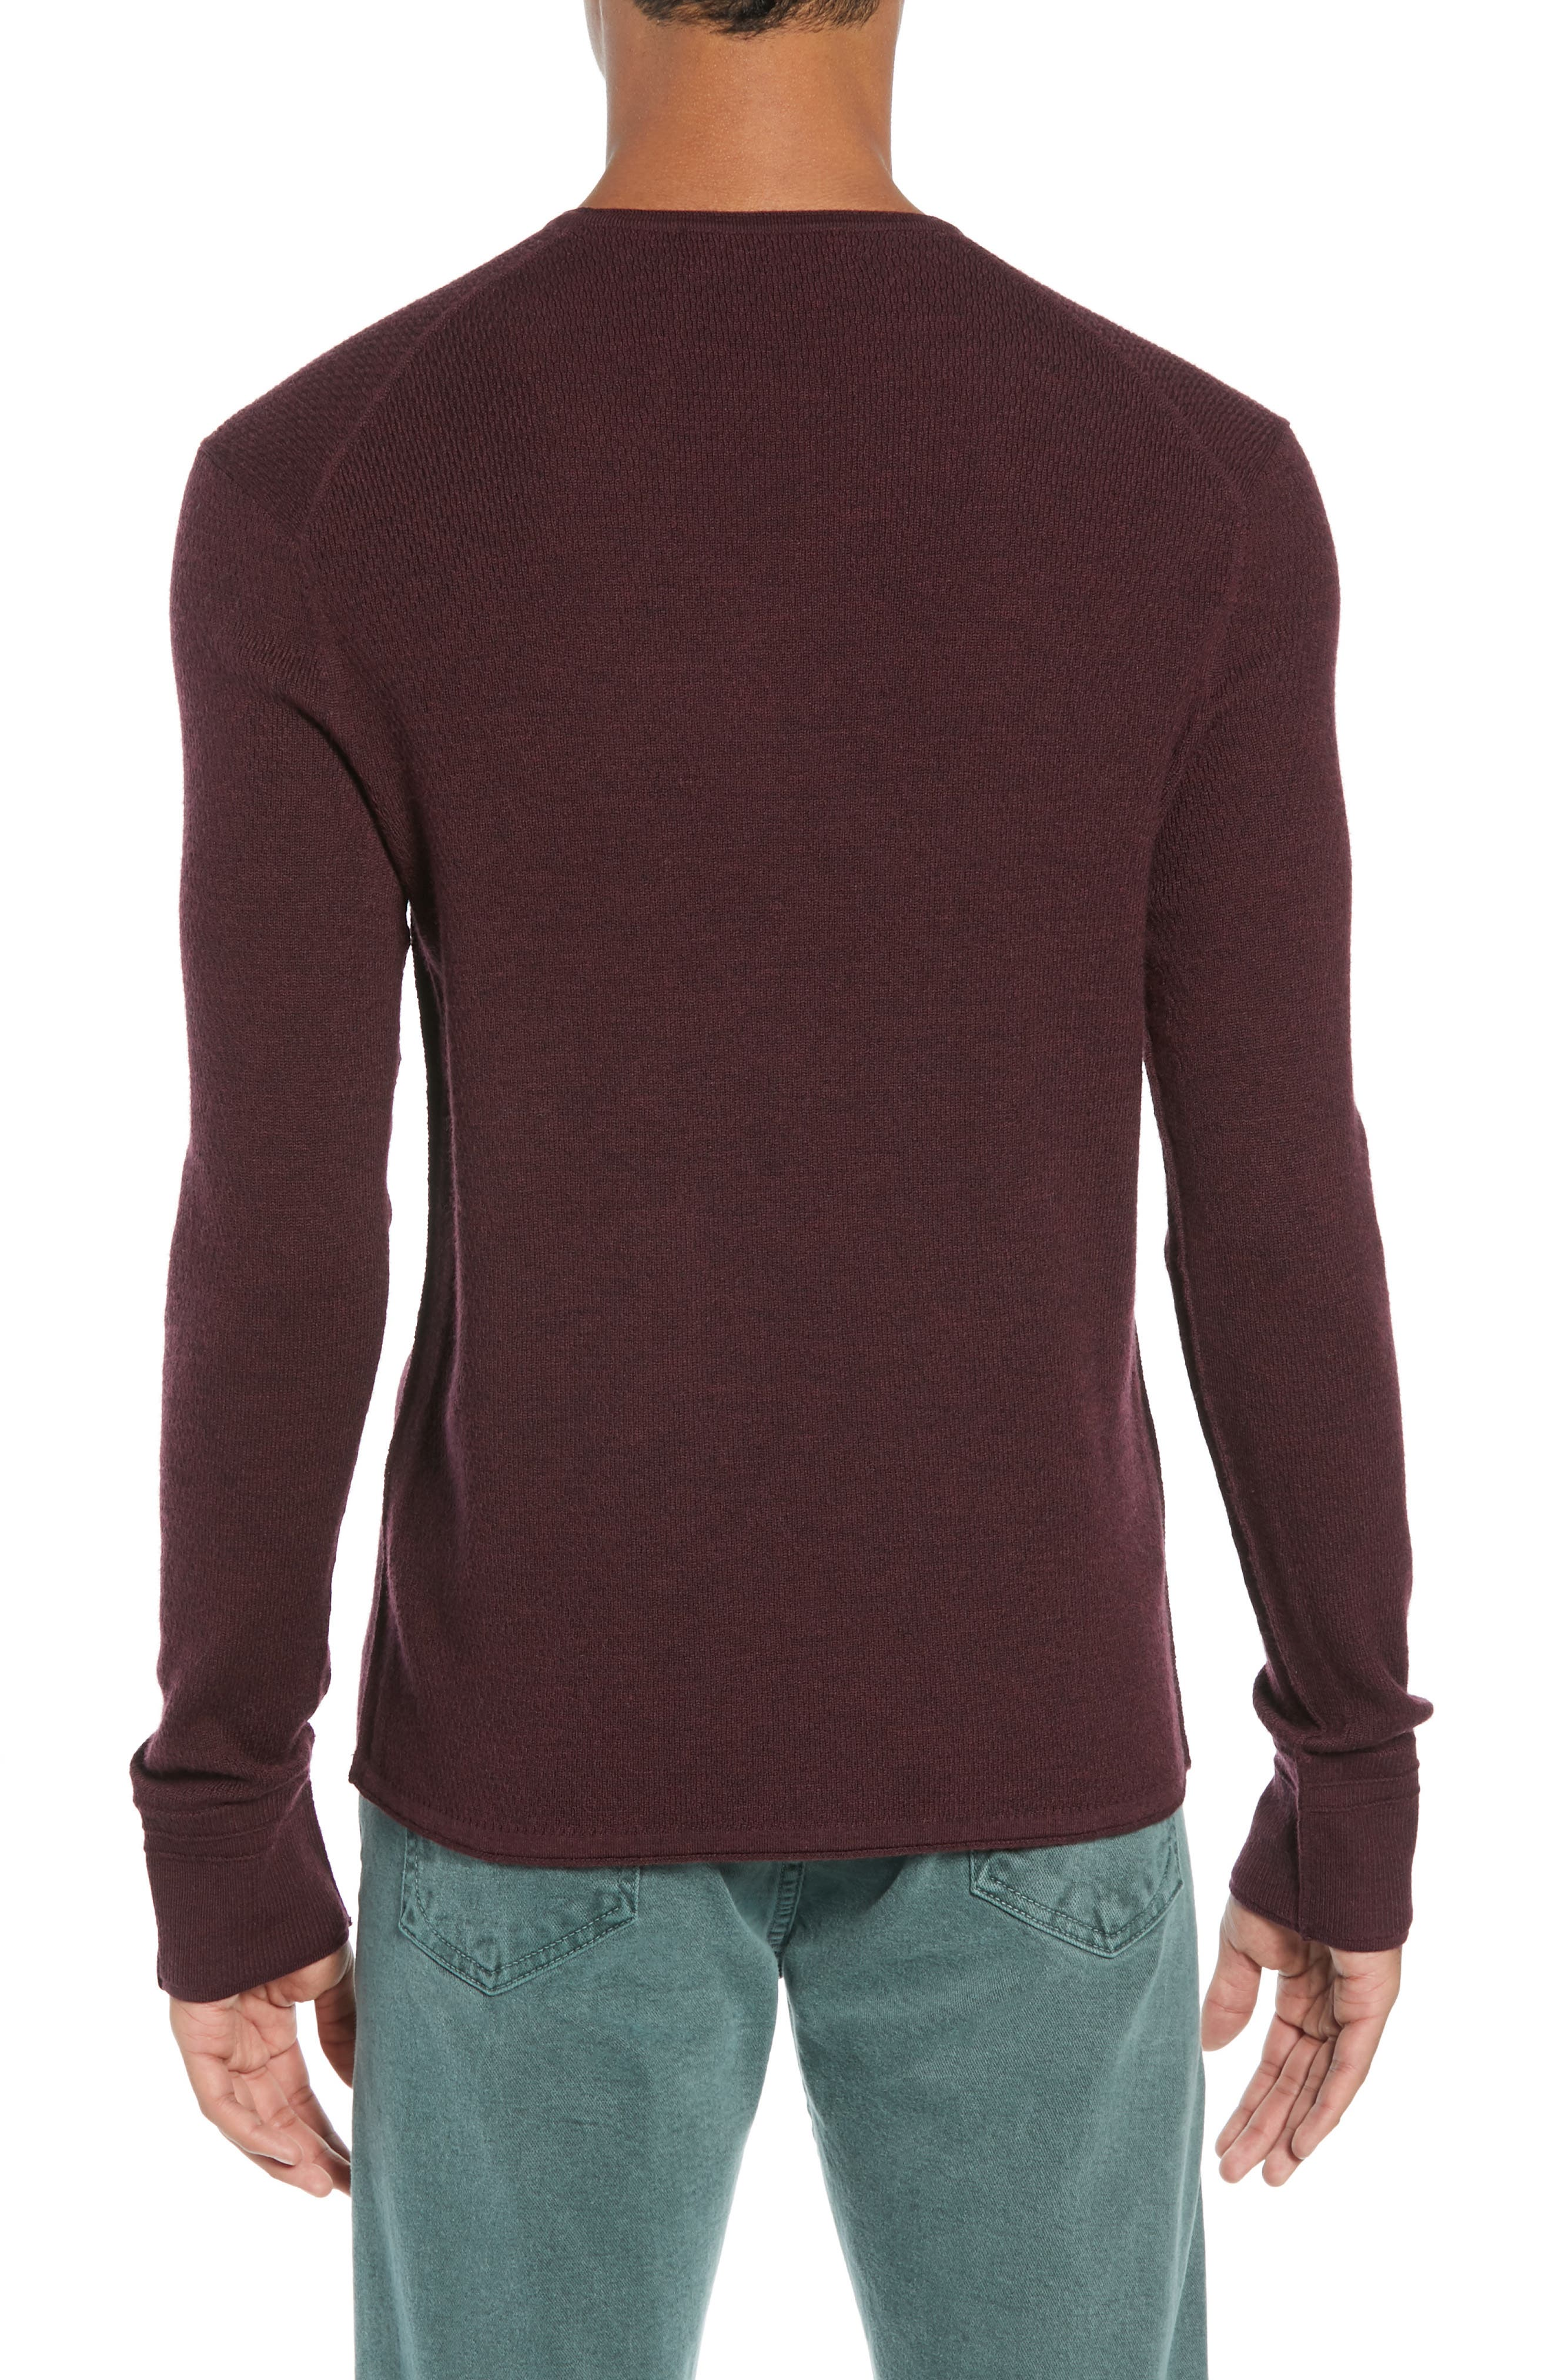 Gregory Merino Wool Blend Crewneck Sweater,                             Alternate thumbnail 2, color,                             BURGUNDY